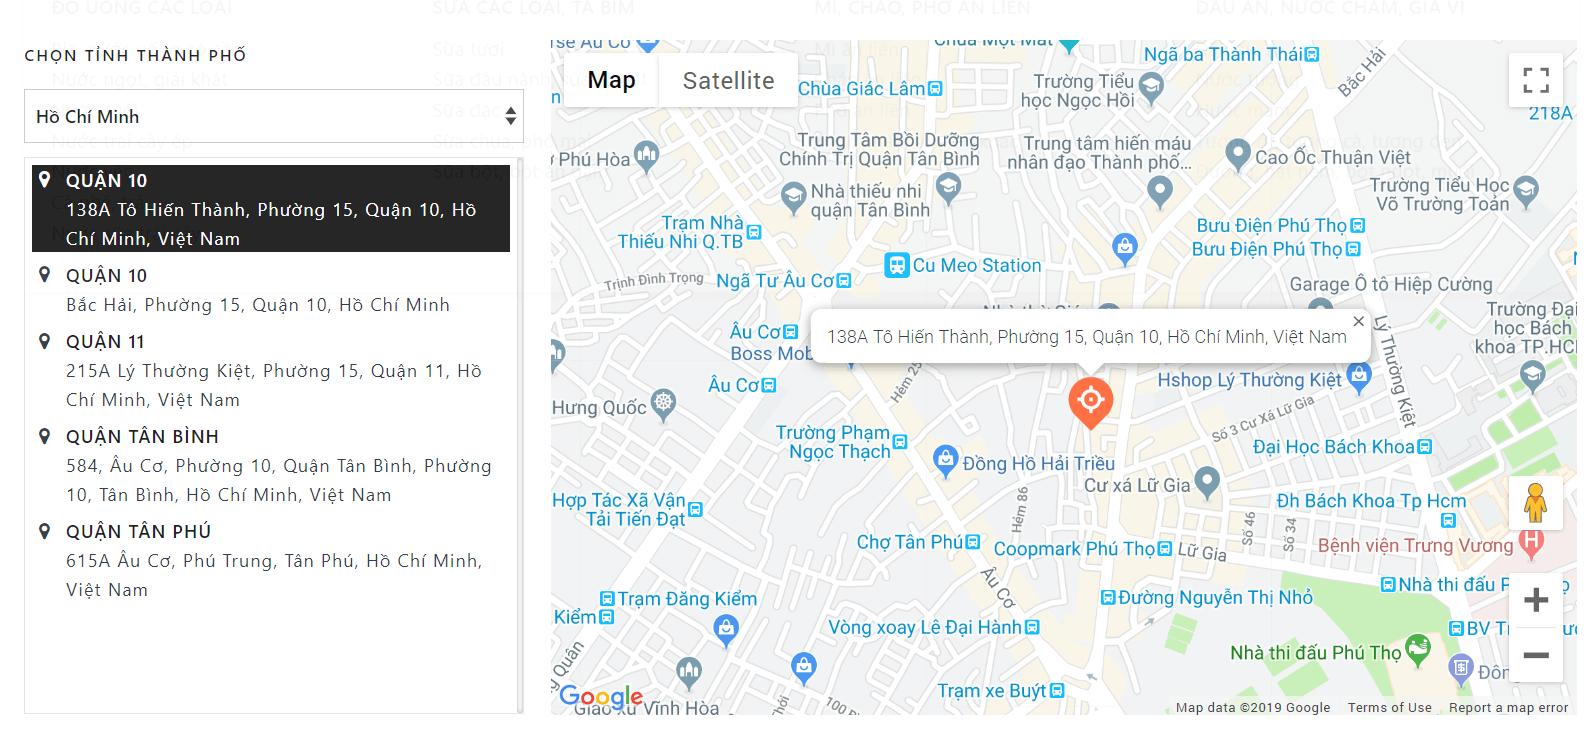 Evo Fresh bản đồ